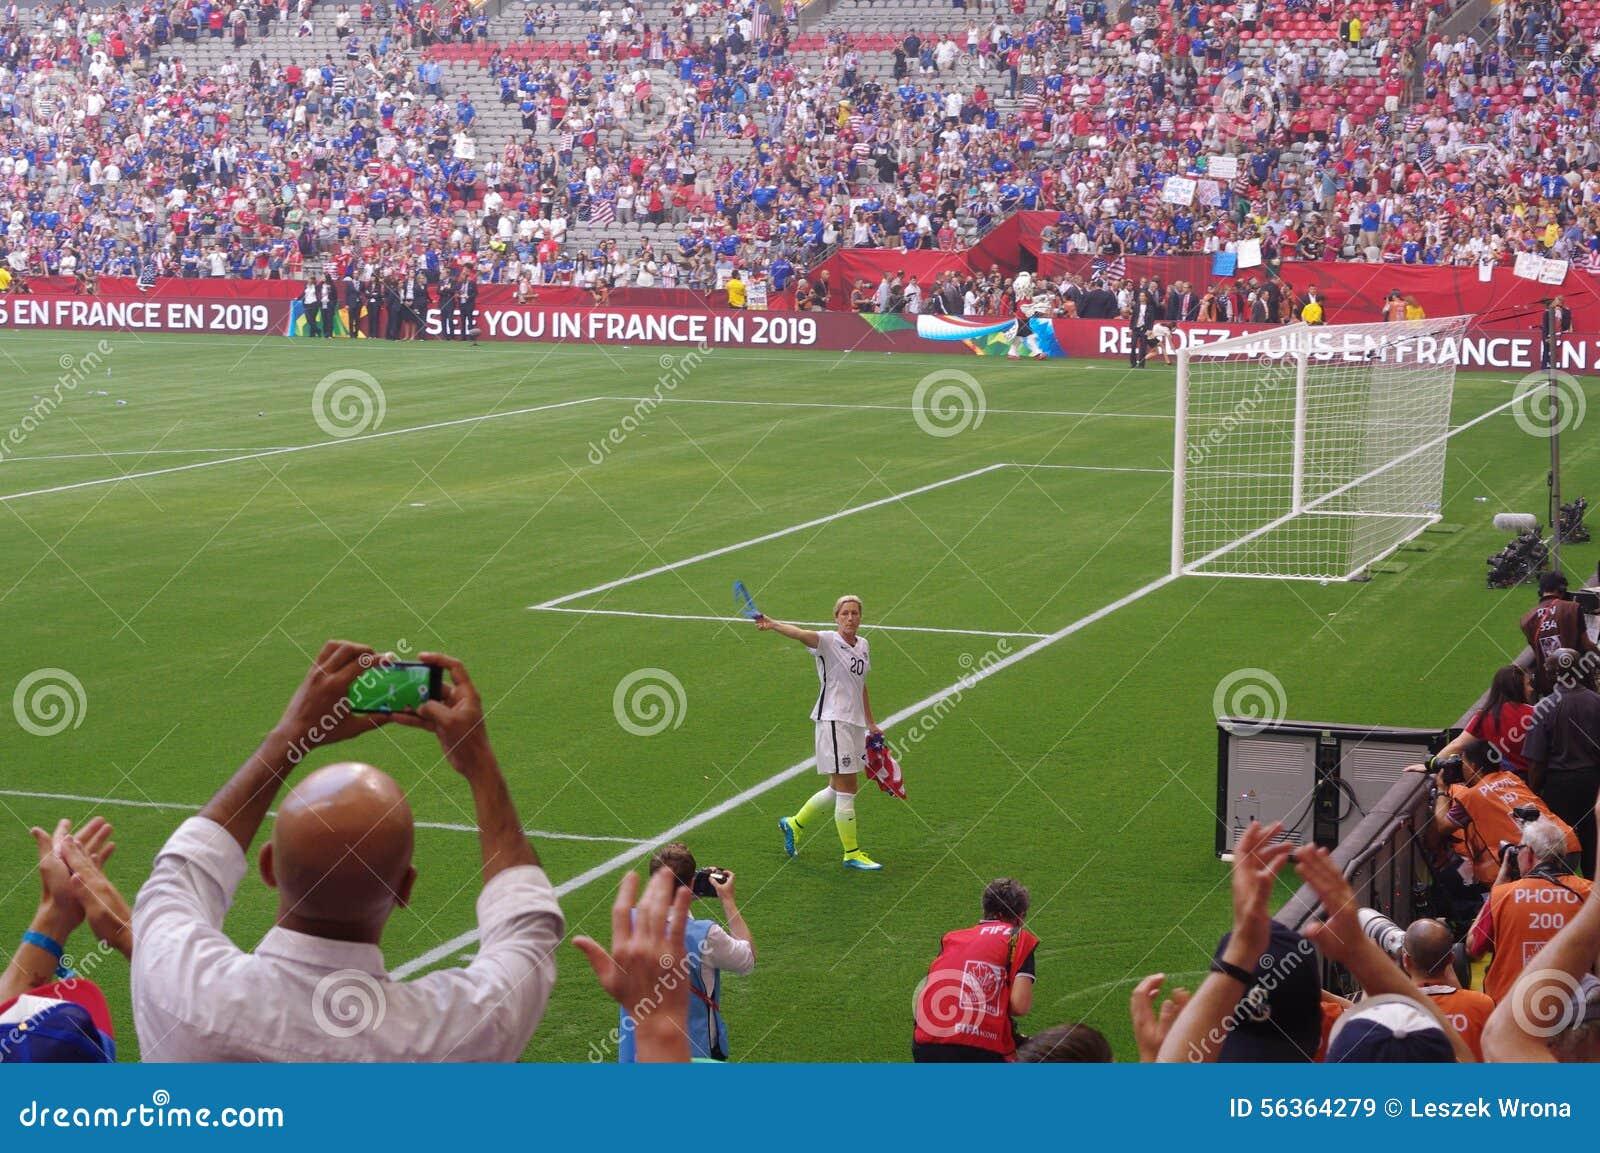 L Equipe De Football De Femmes Des Usa Celebrent Gagner La Coupe Du Monde 2015 De La Fifa Image Stock Editorial Image Du Celebrent Football 56364279